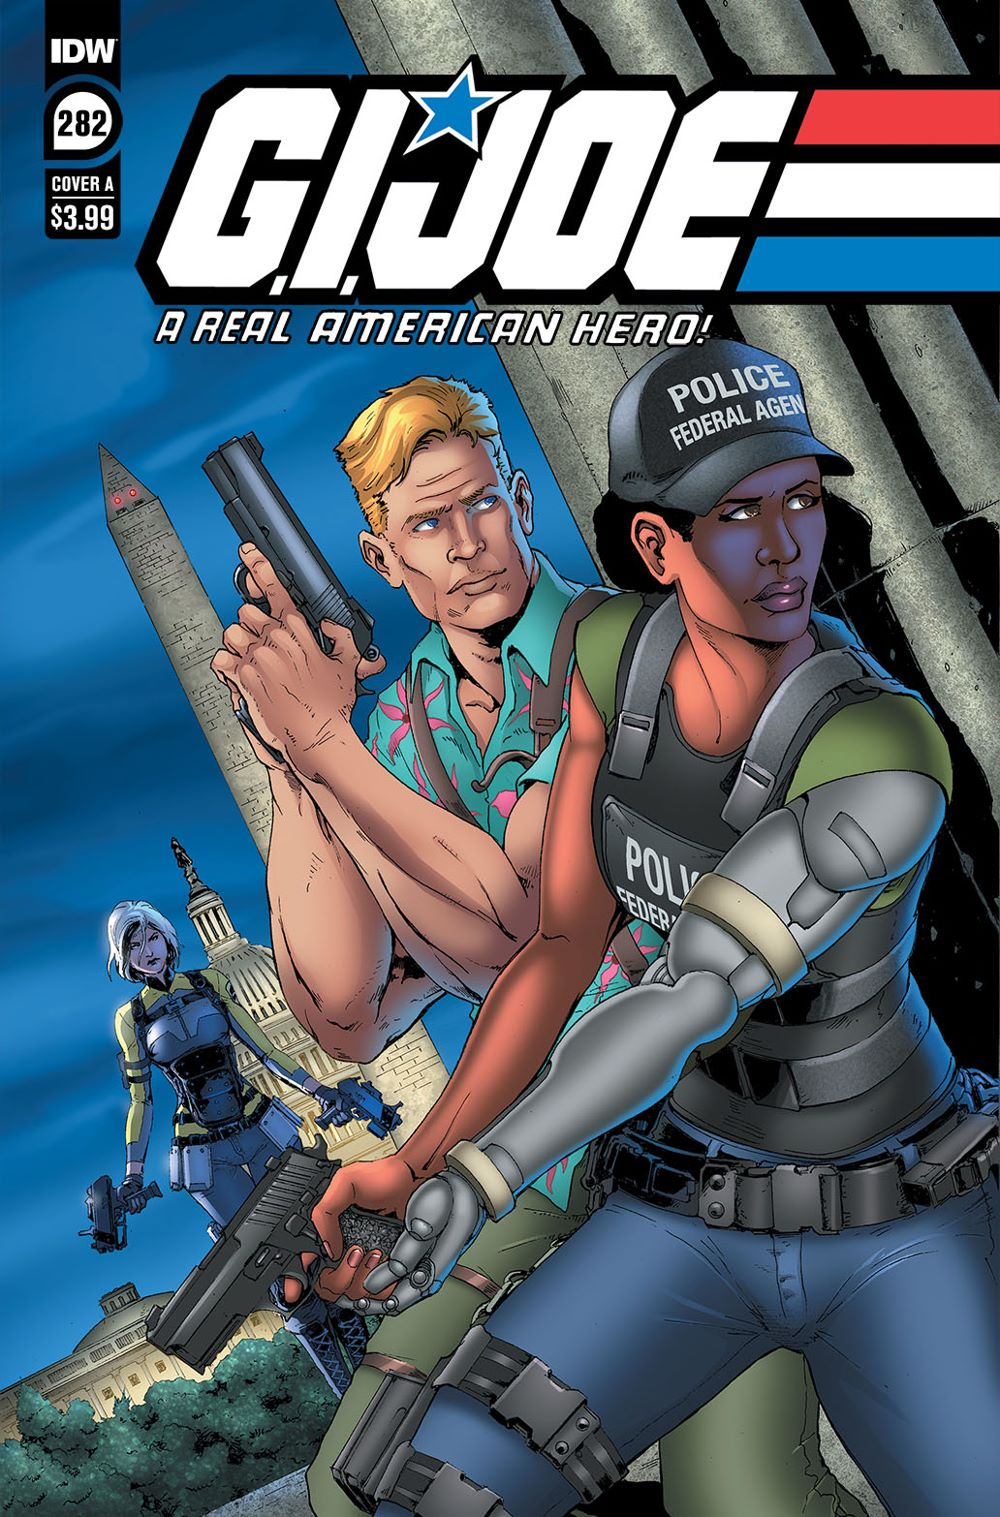 GIJoeRAH282-coverA-copy IDW Publishing April 2021 Solicitations